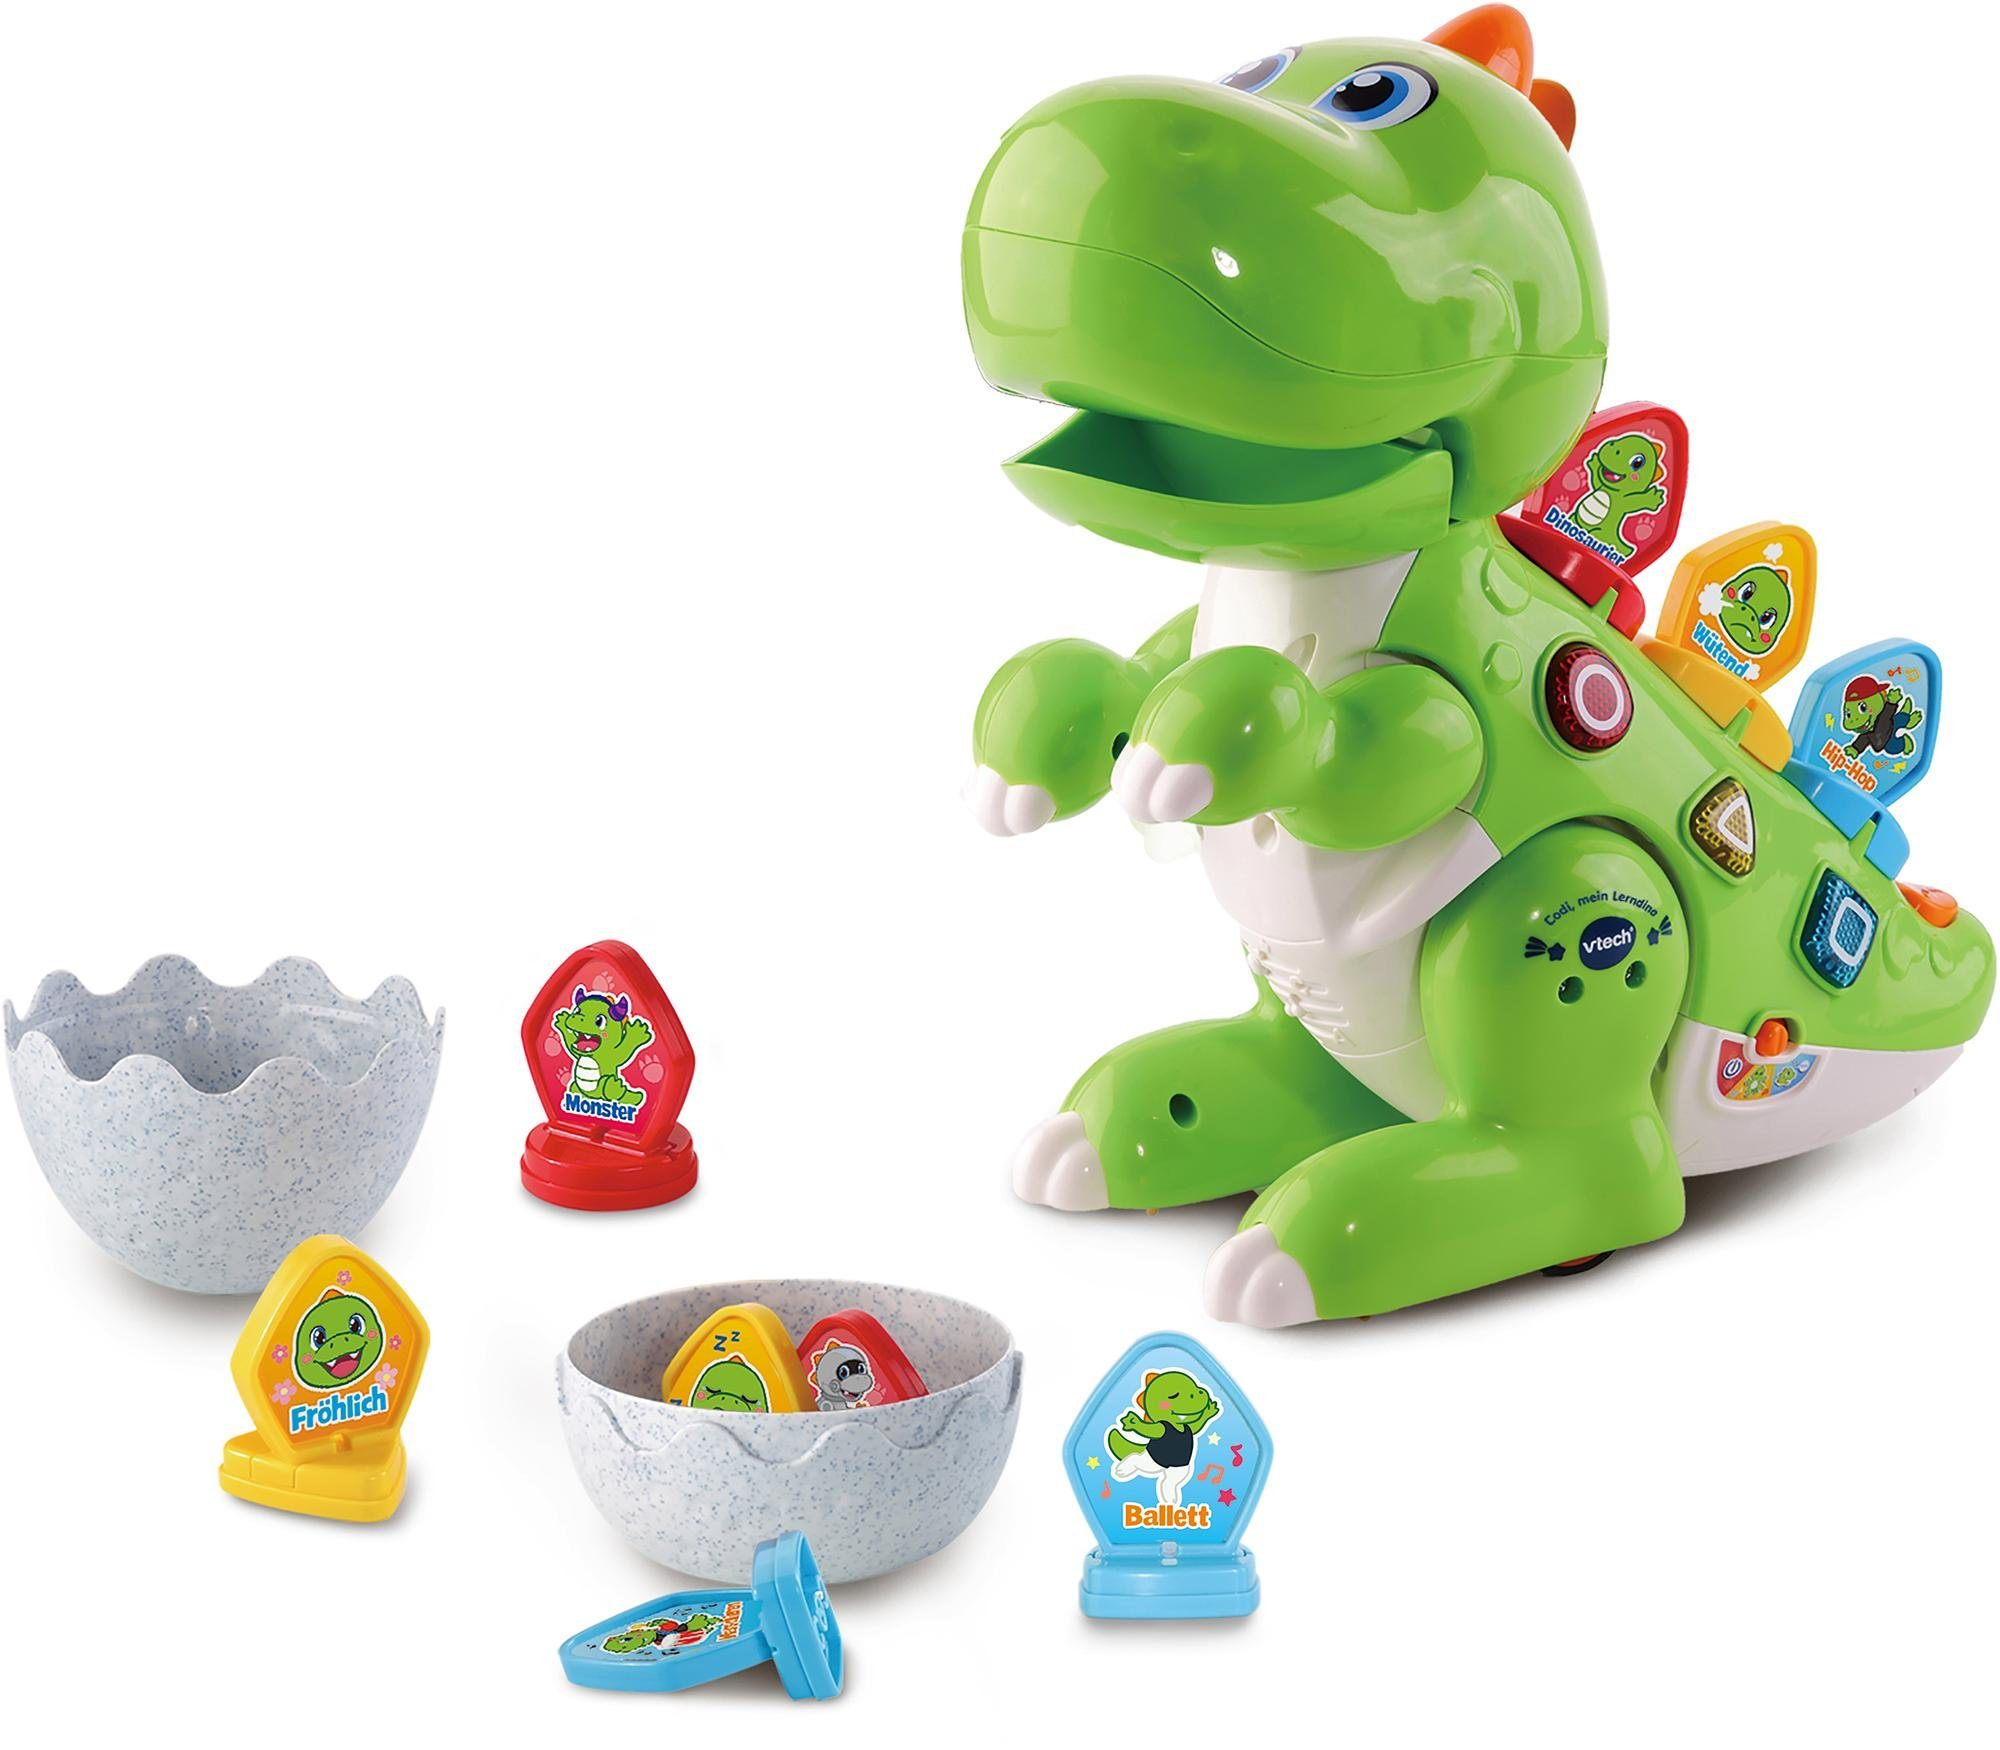 Vtech Lernspielzeug Codi mein Lerndino Technik & Freizeit/Spielzeug/Lernspielzeug/Lernspiele